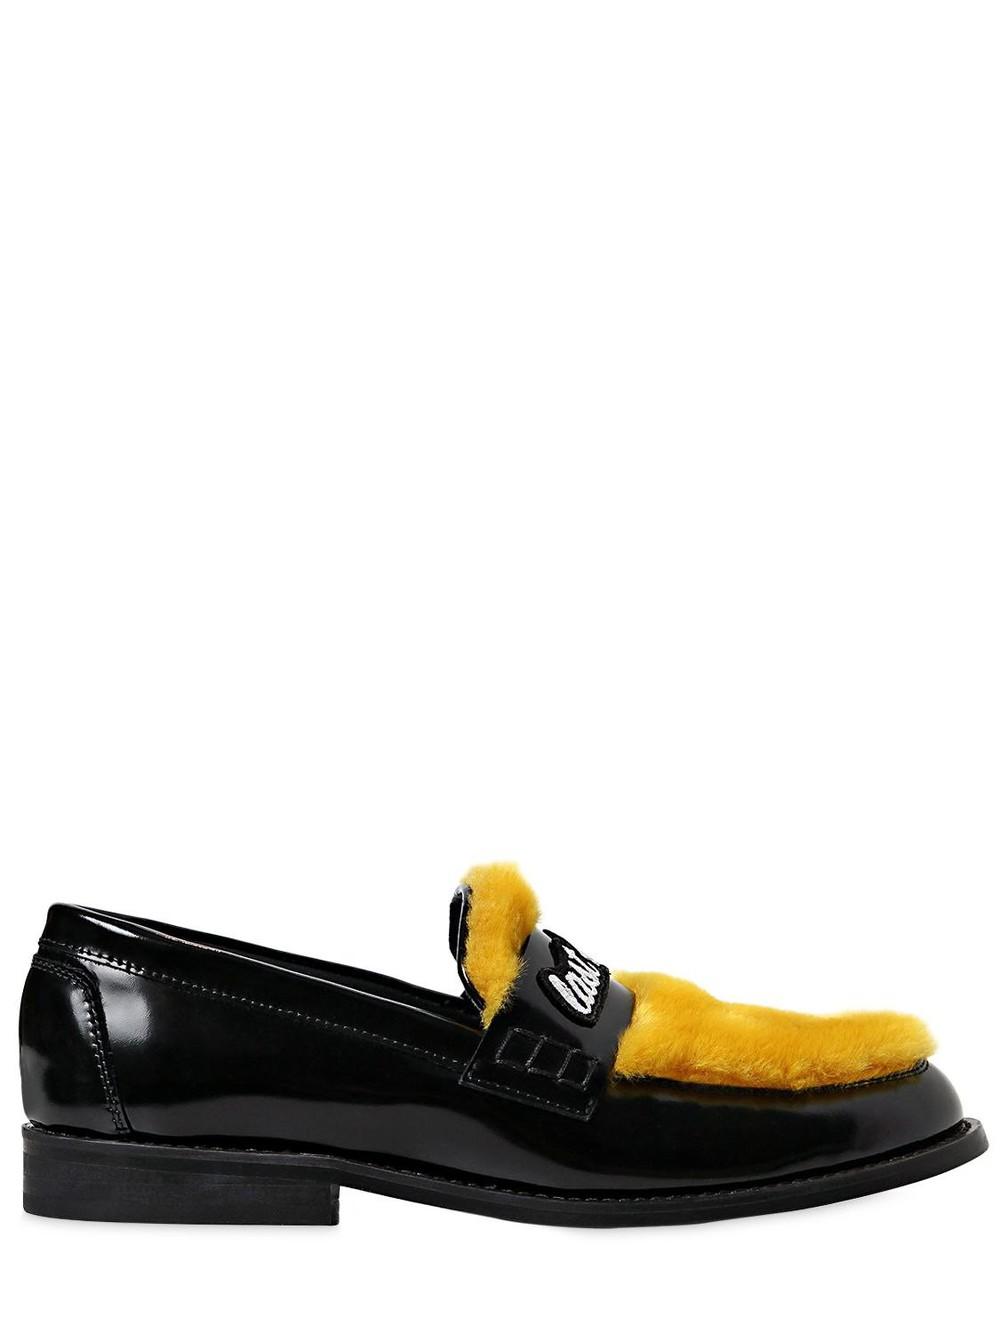 JOSHUA SANDERS 20mm Last Dance Leather Loafers in black / yellow